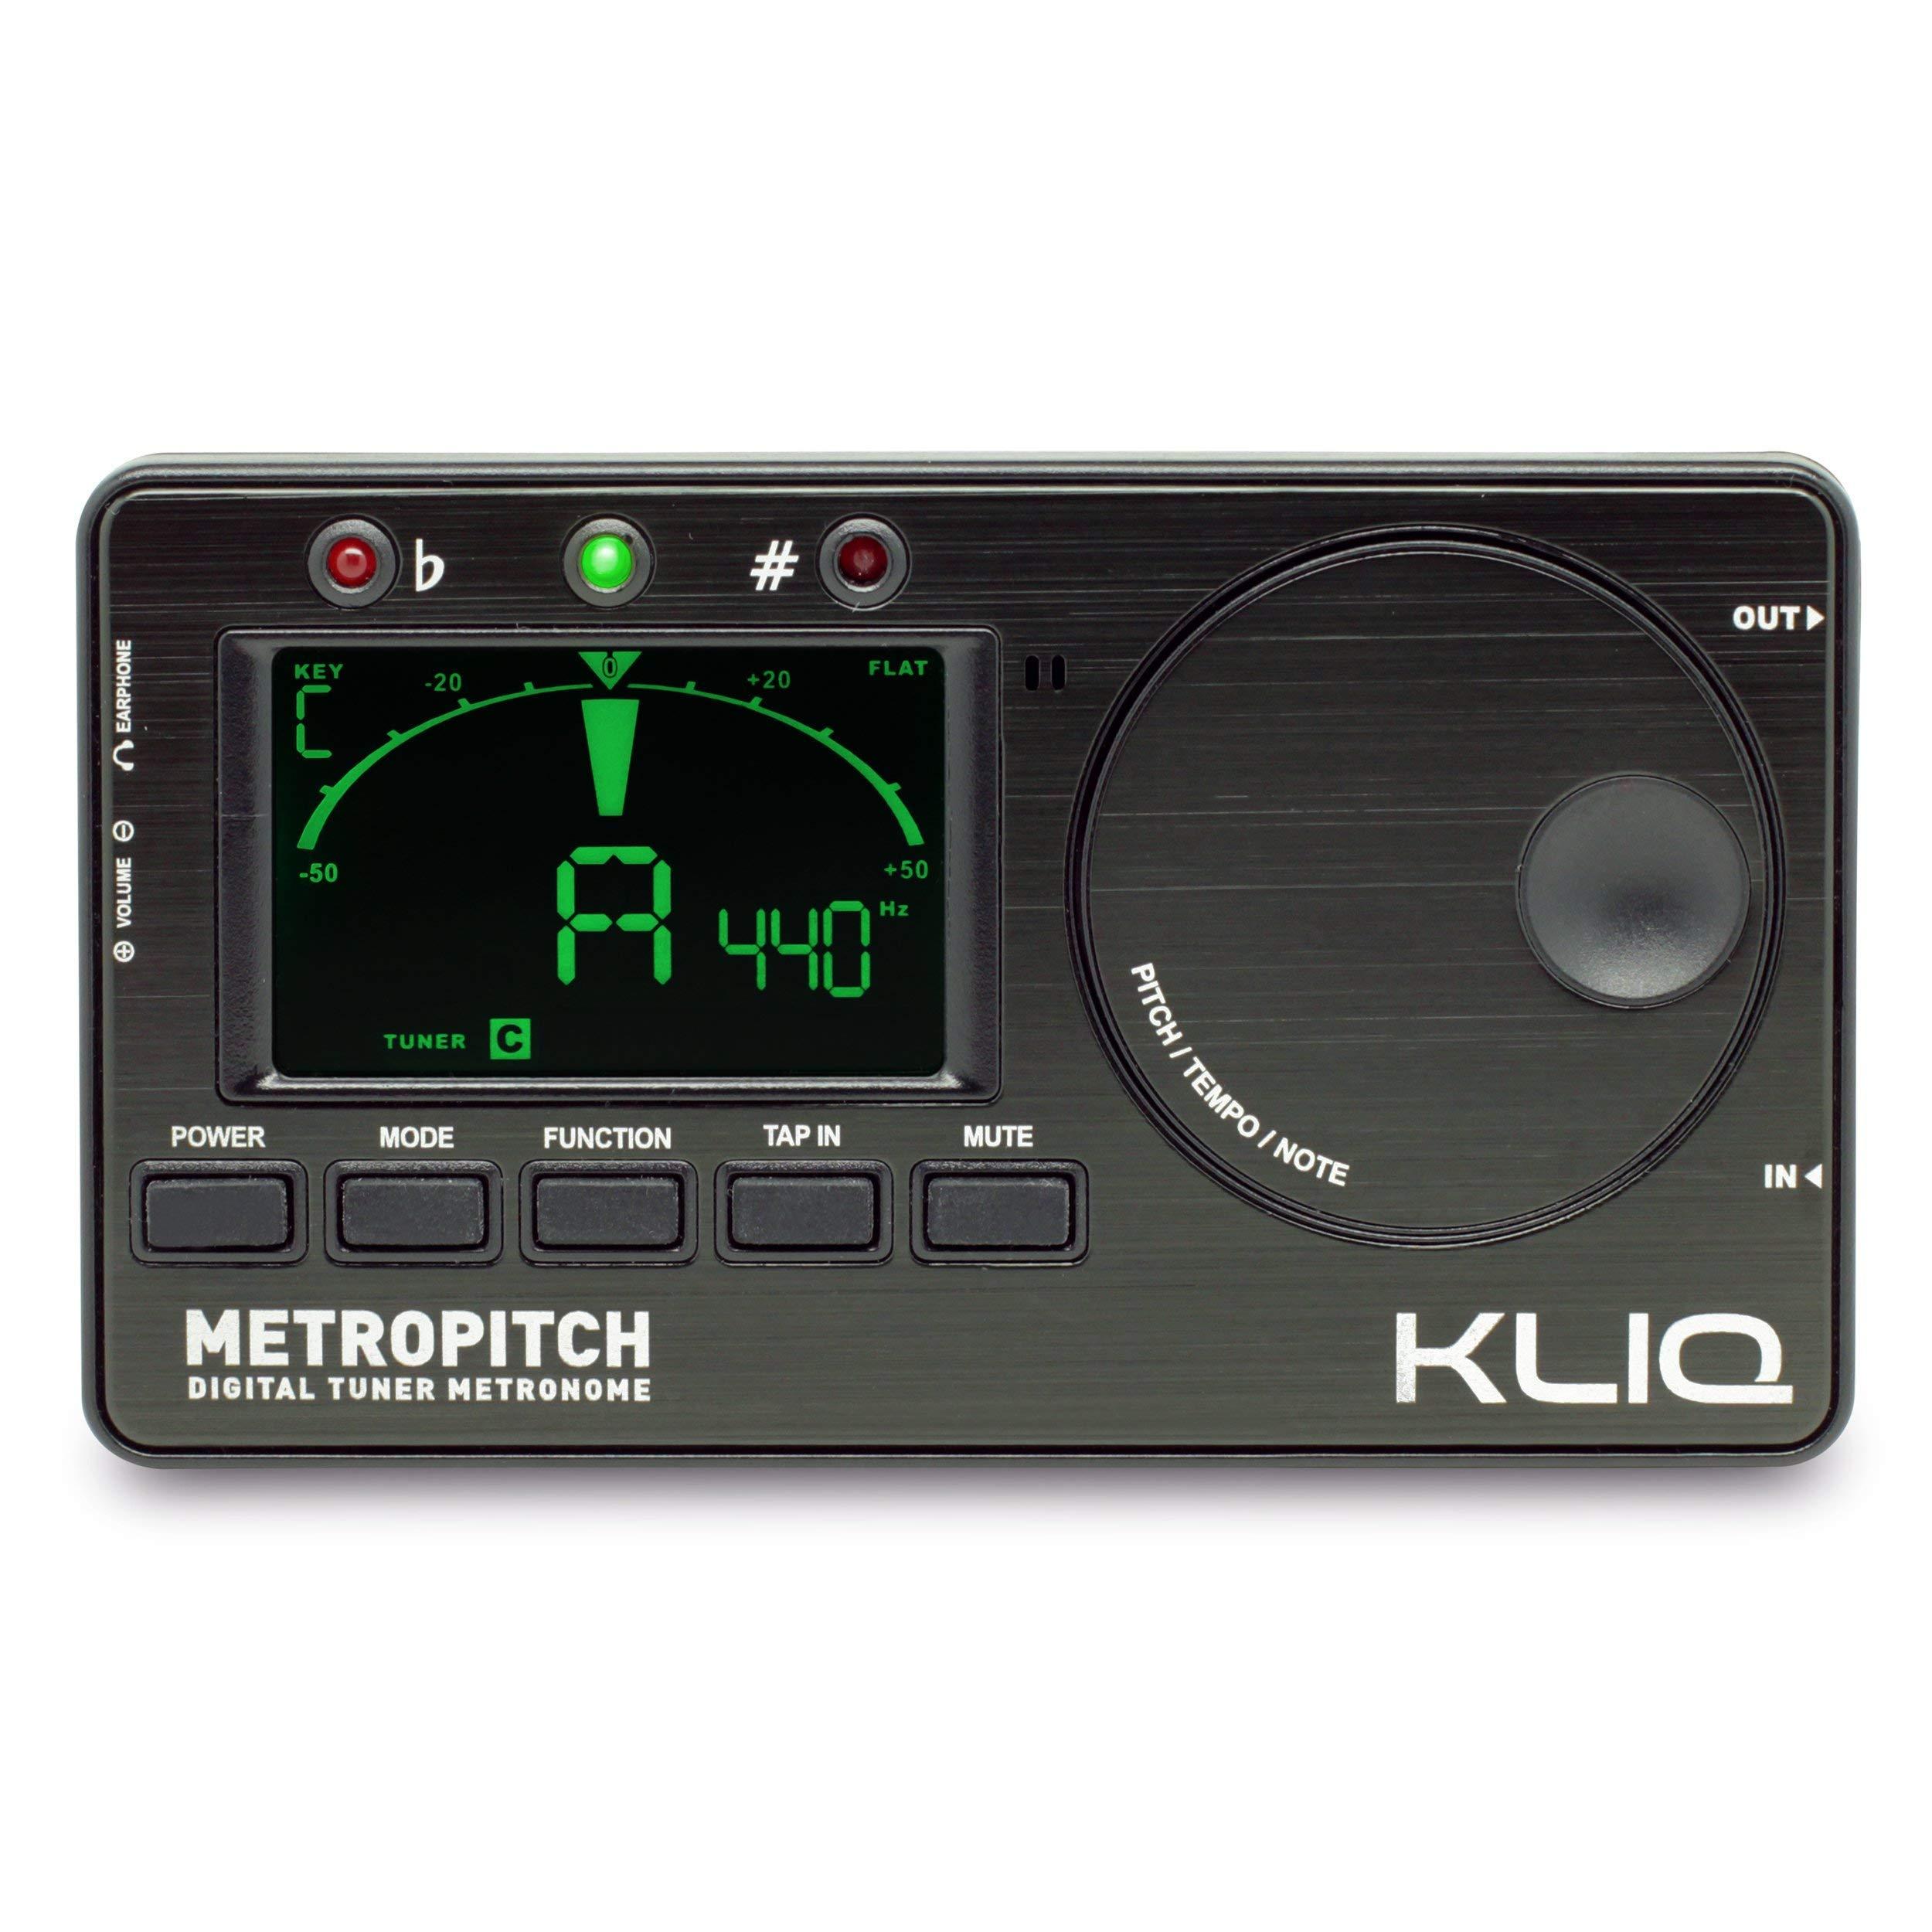 KLIQ MetroPitch Metronome Instruments Chromatic